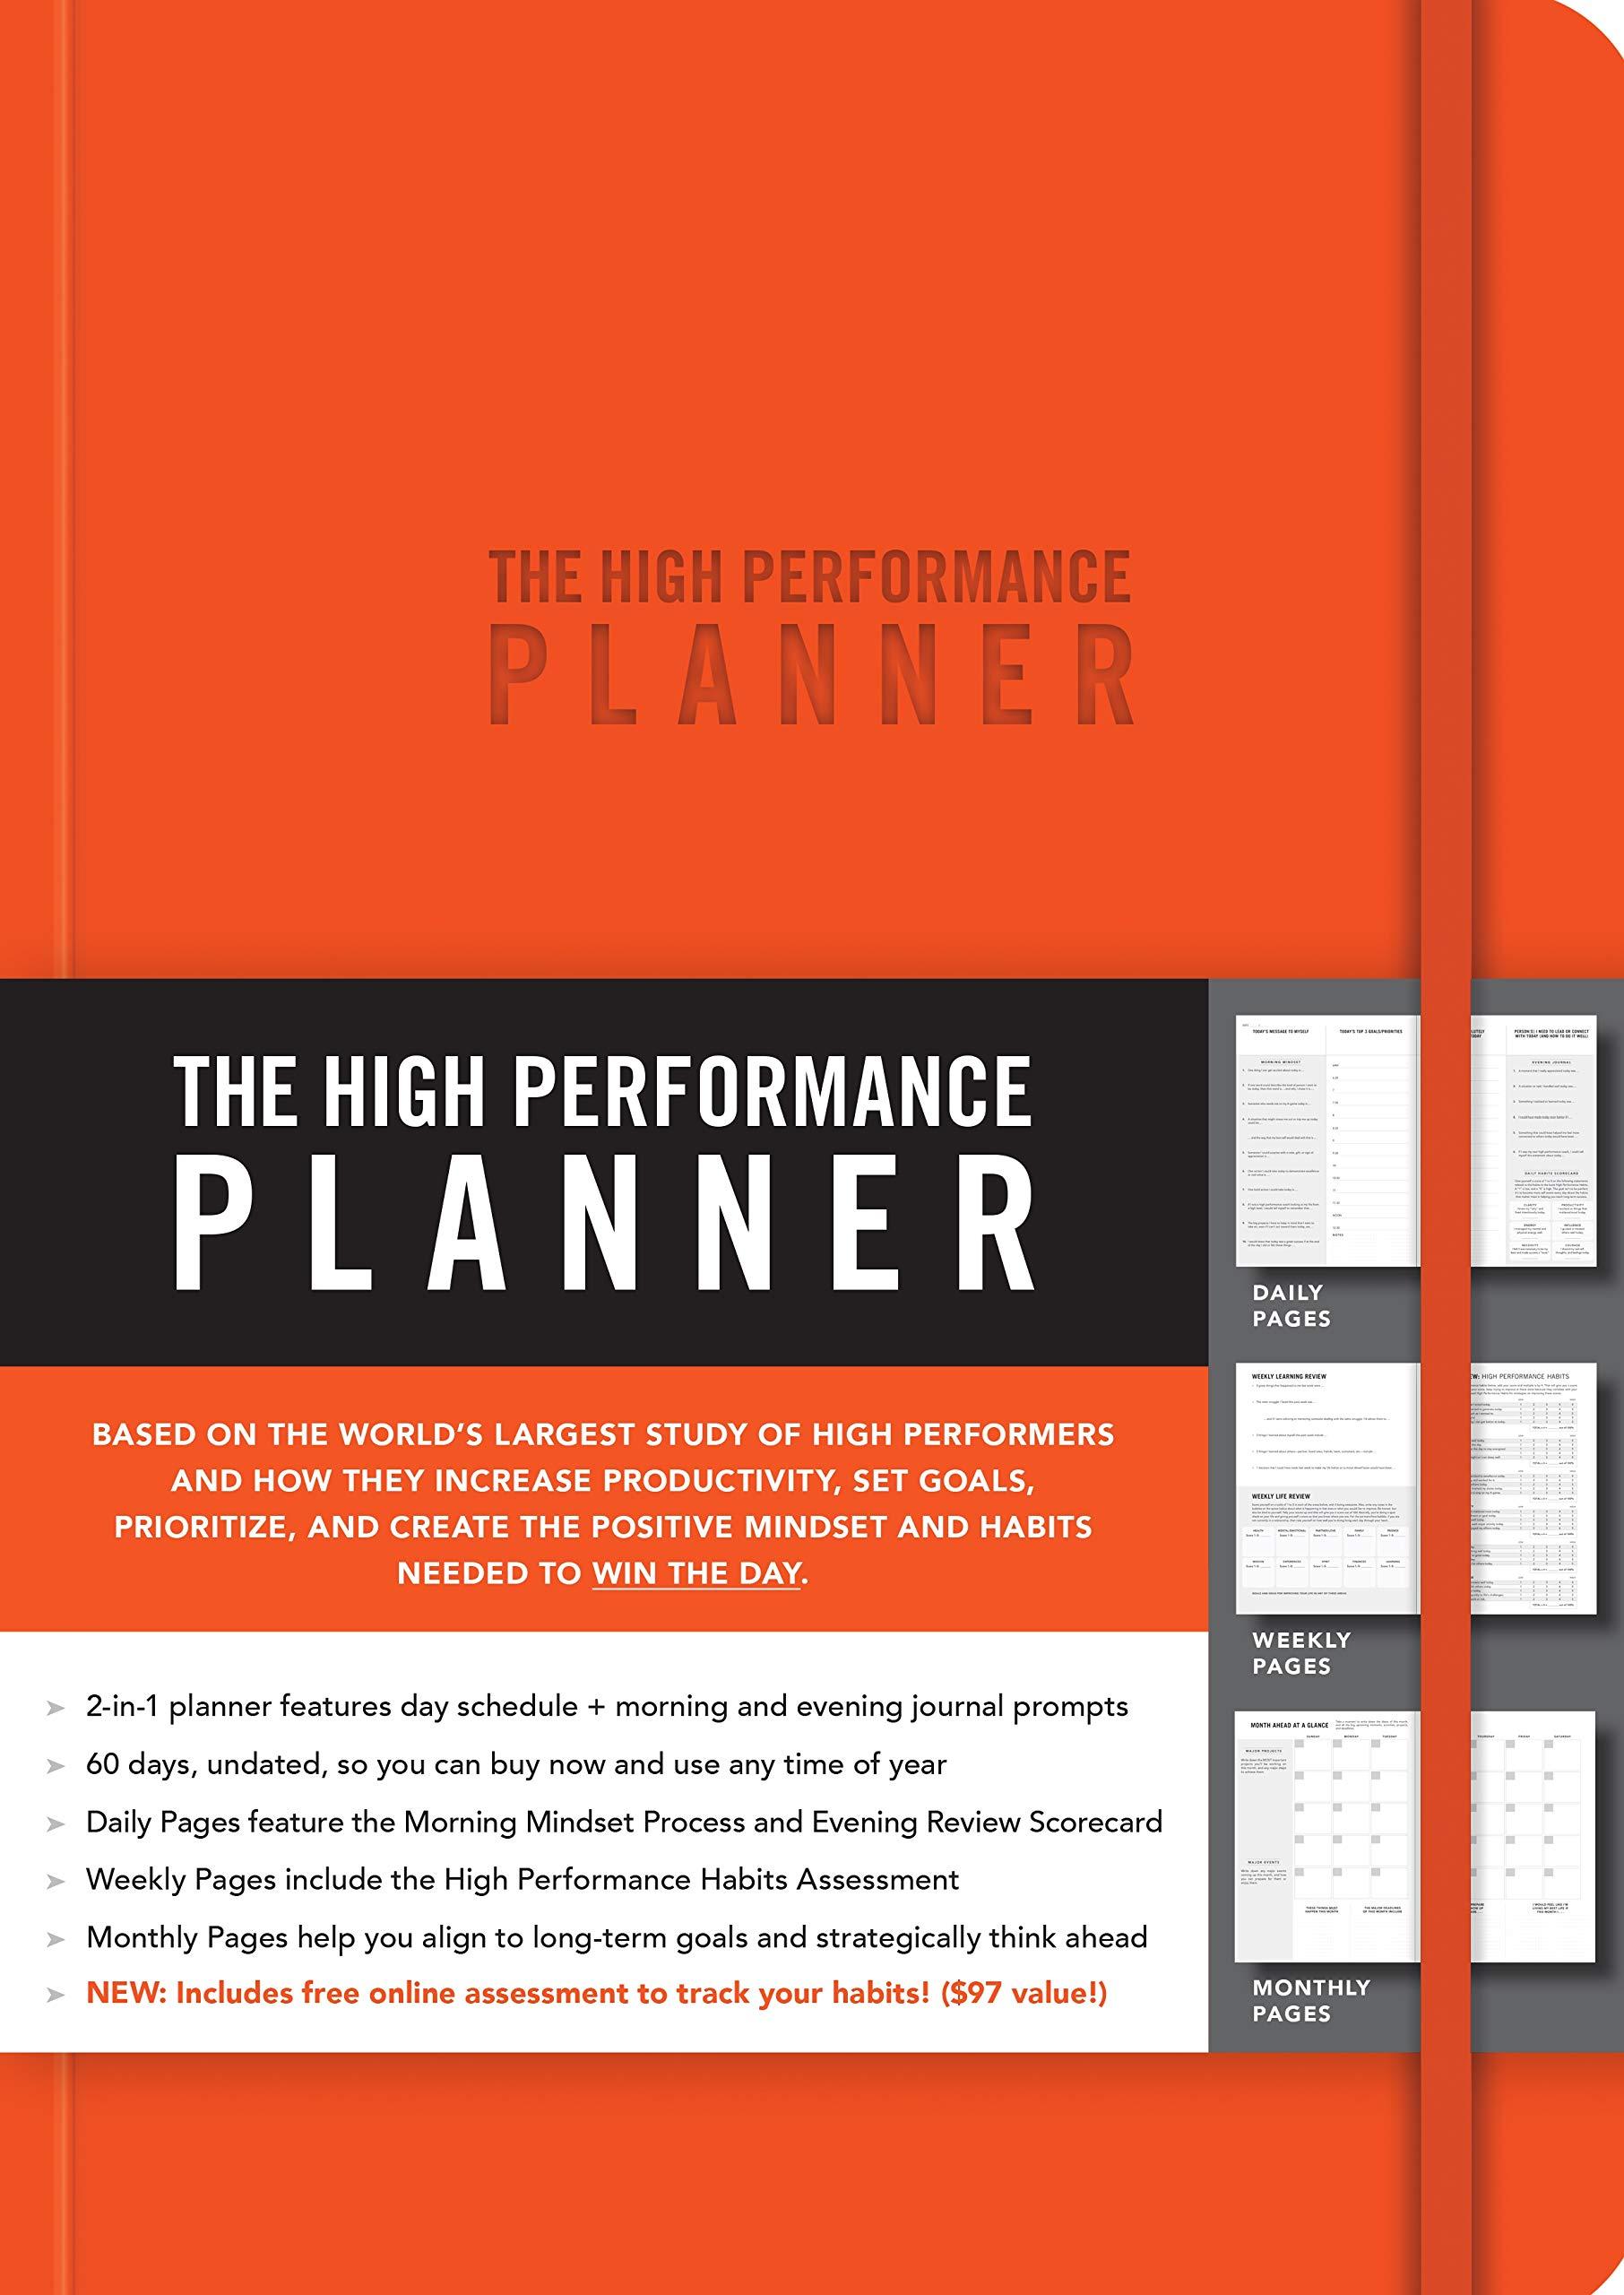 amazon com the high performance planner orange 9781401957346